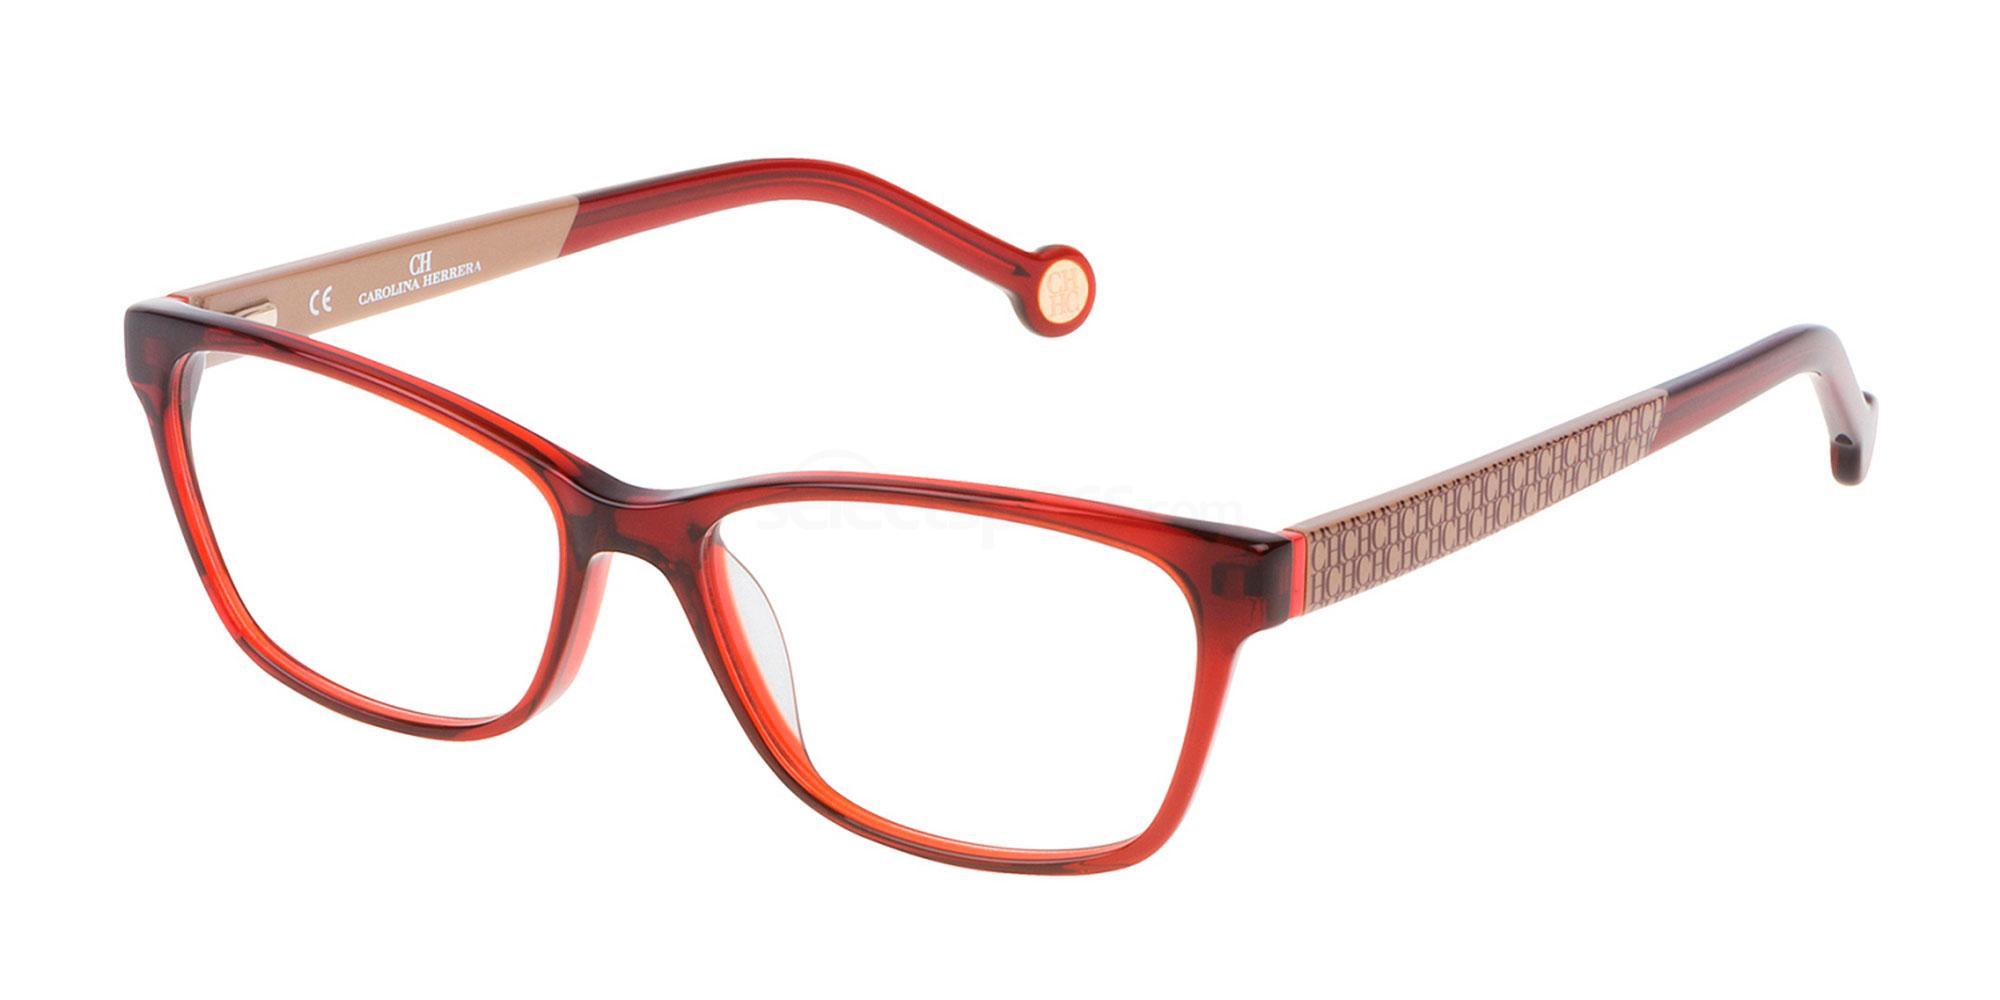 06DC VHE663 Glasses, CH Carolina Herrera